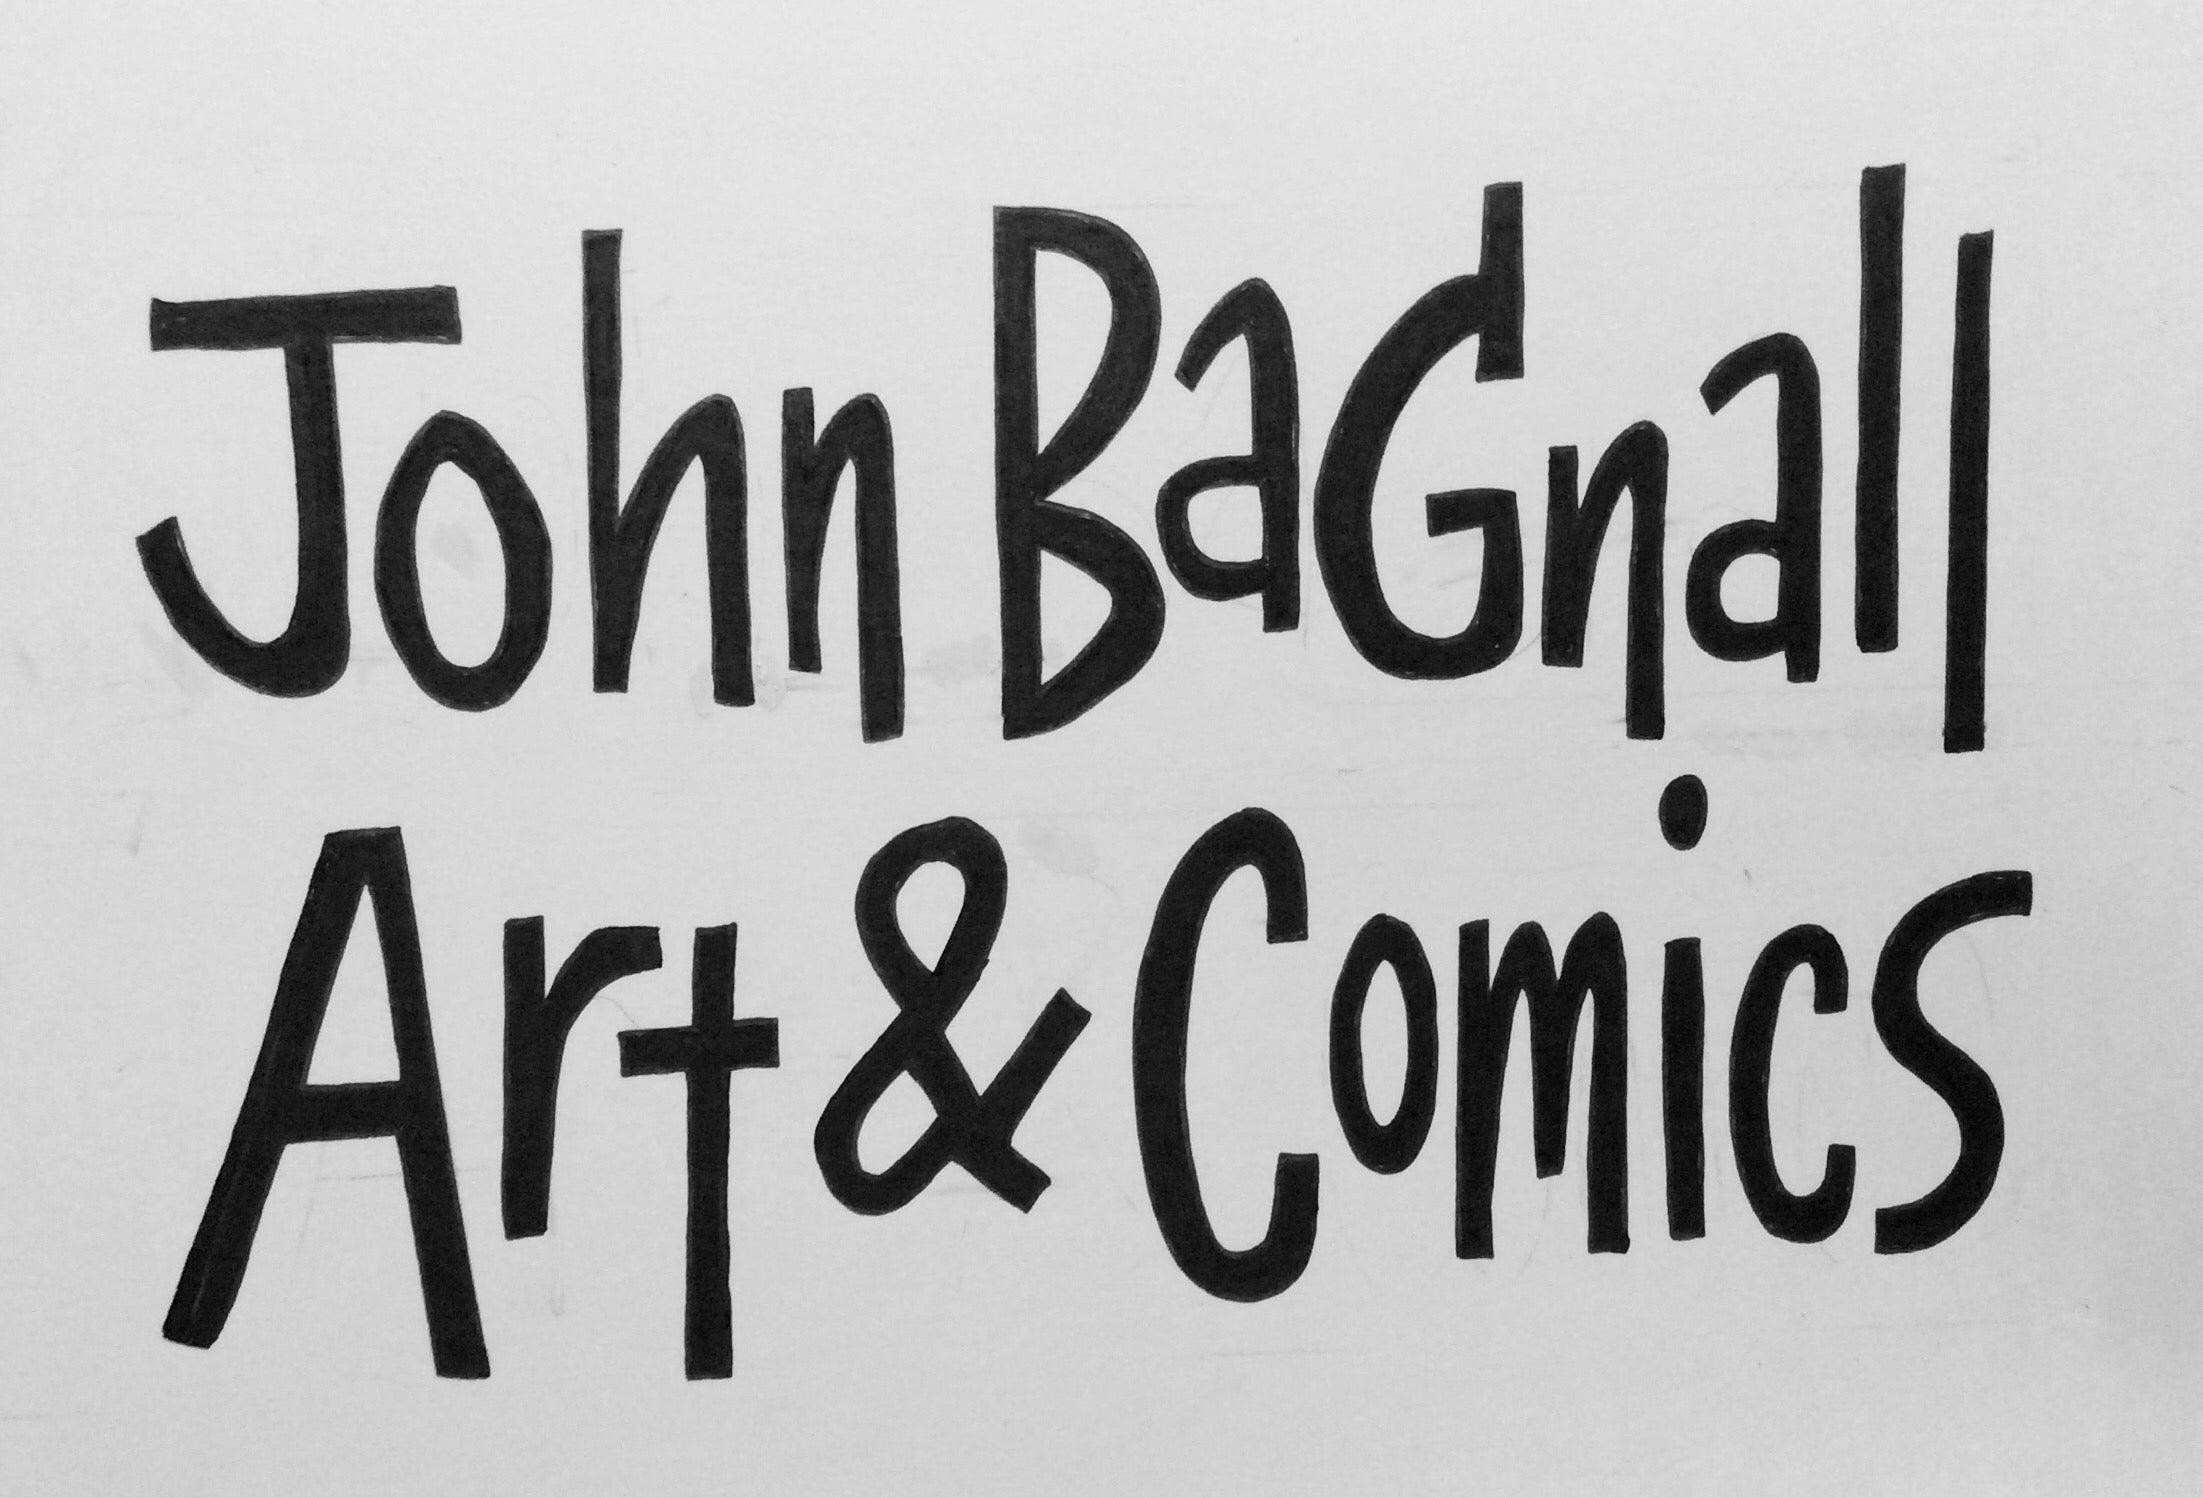 John Bagnall Art